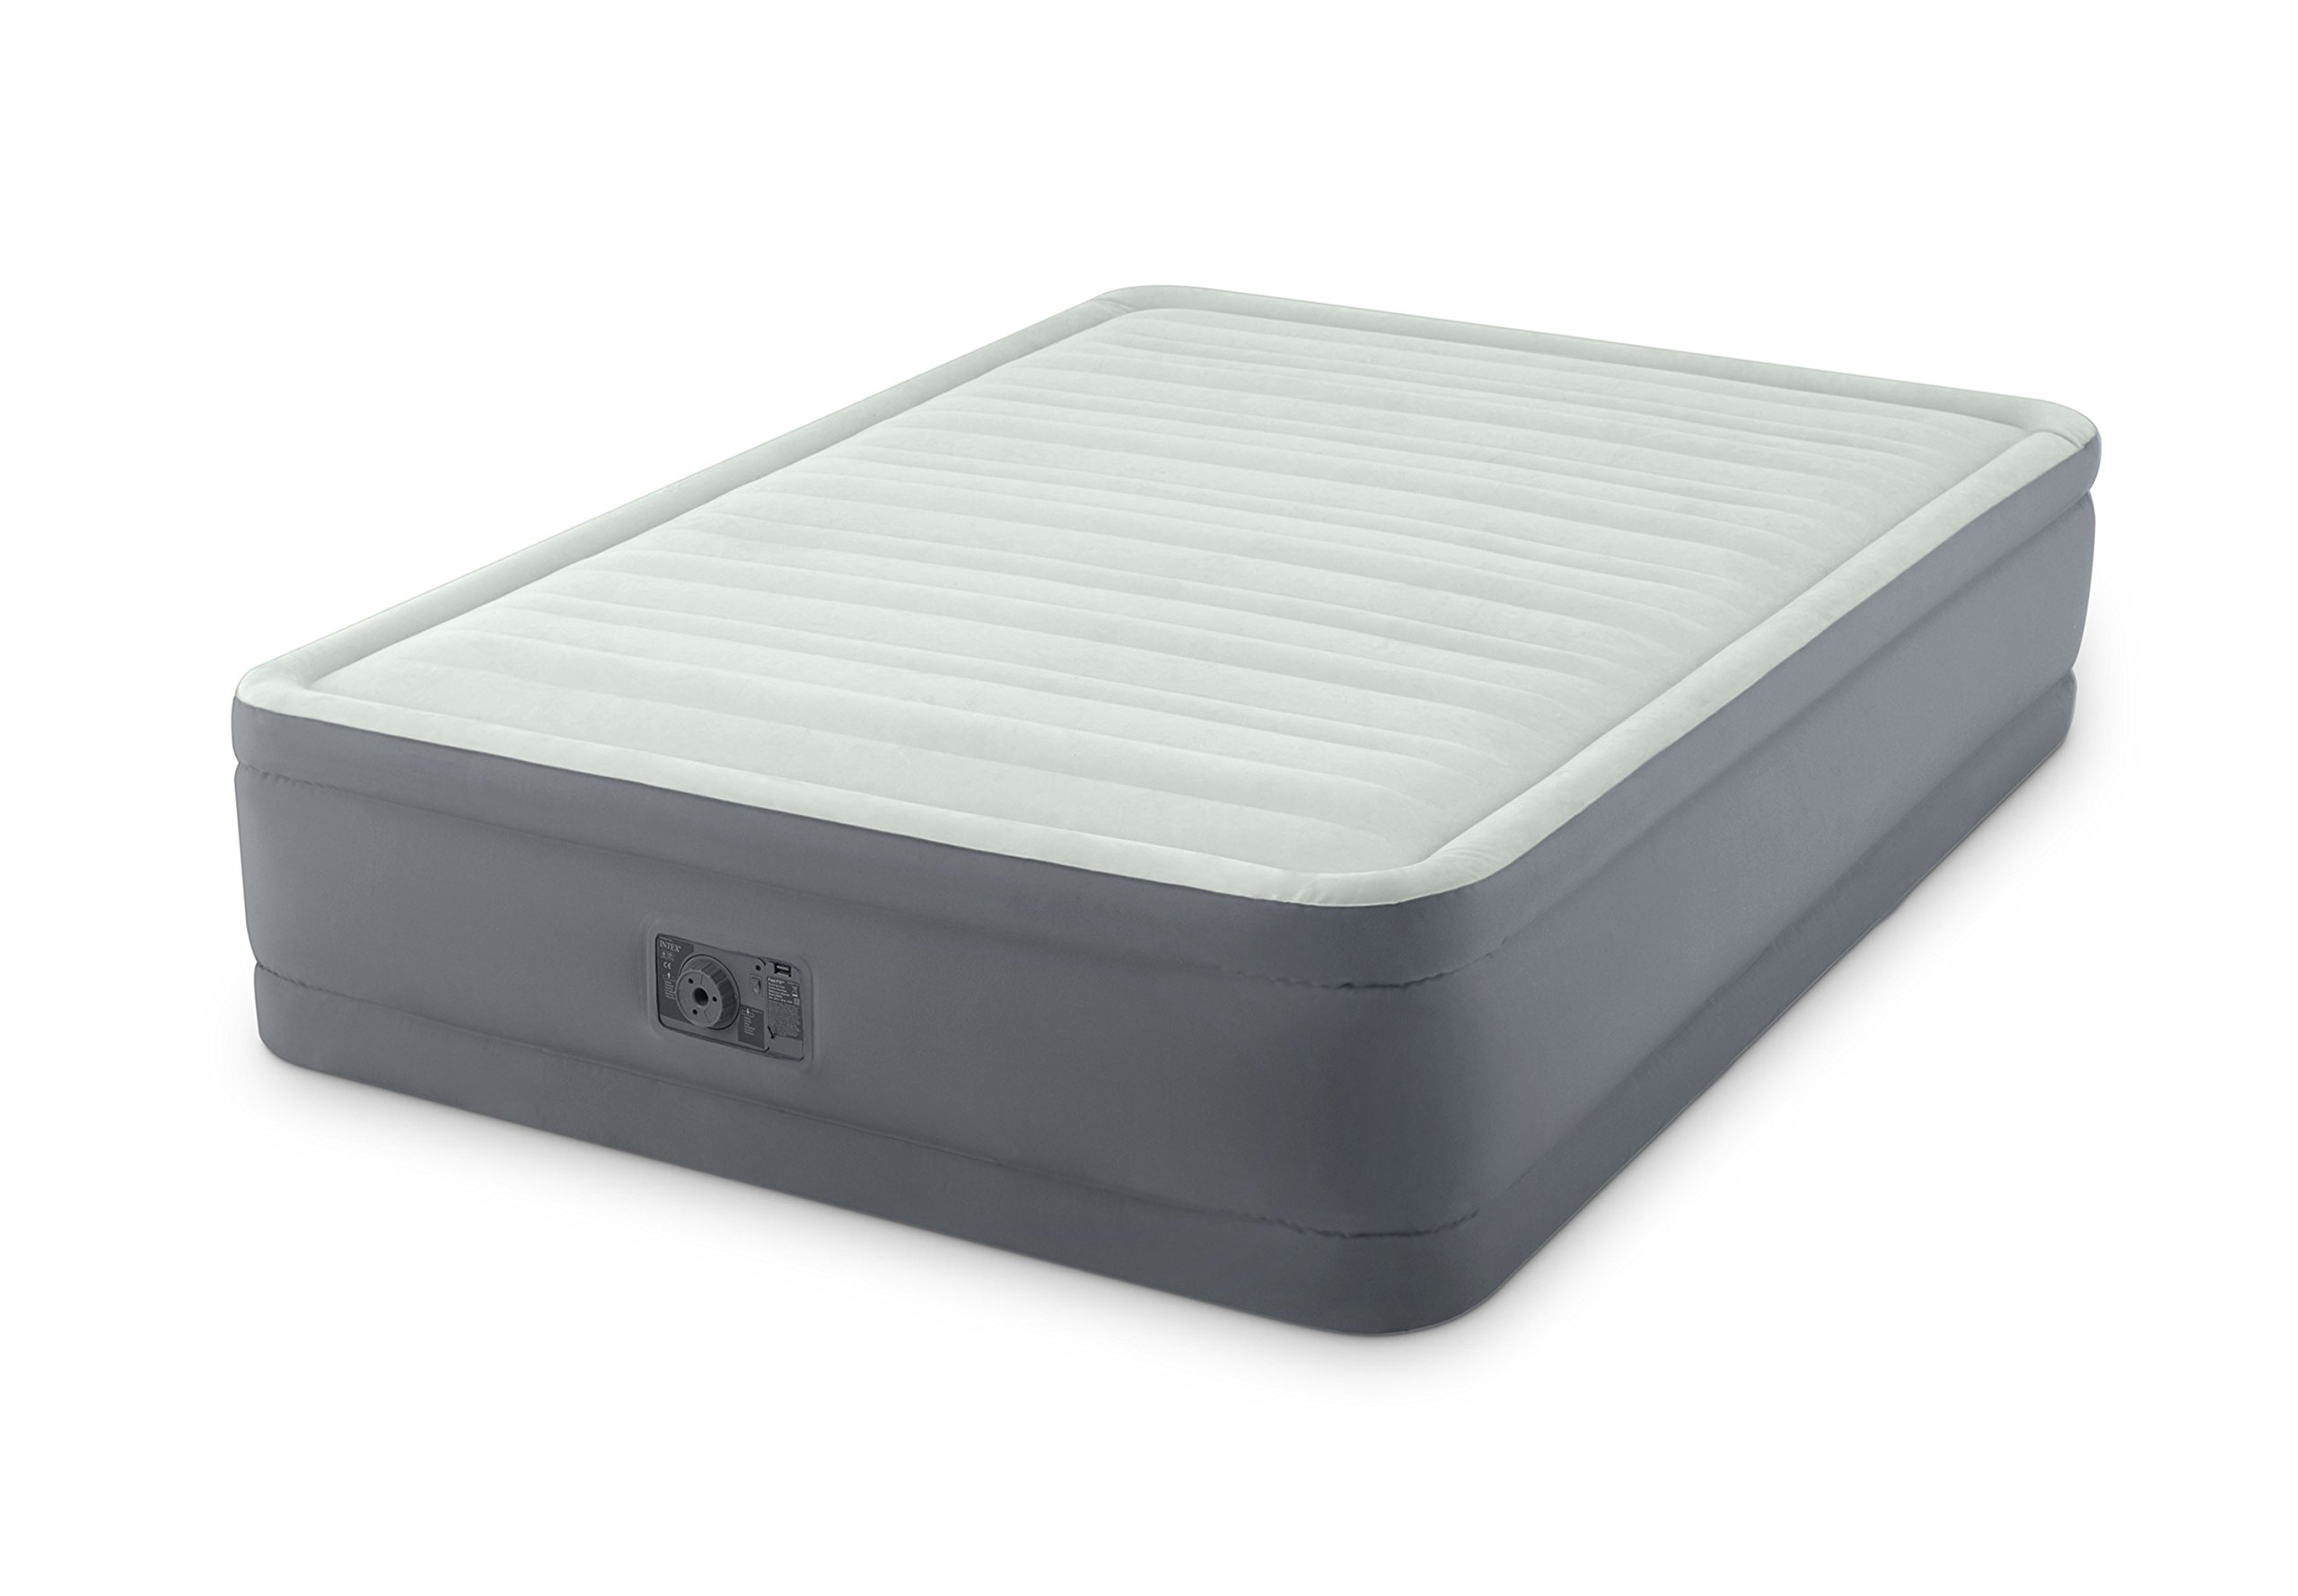 Intex 64901E Premaire Air Bed, Twin